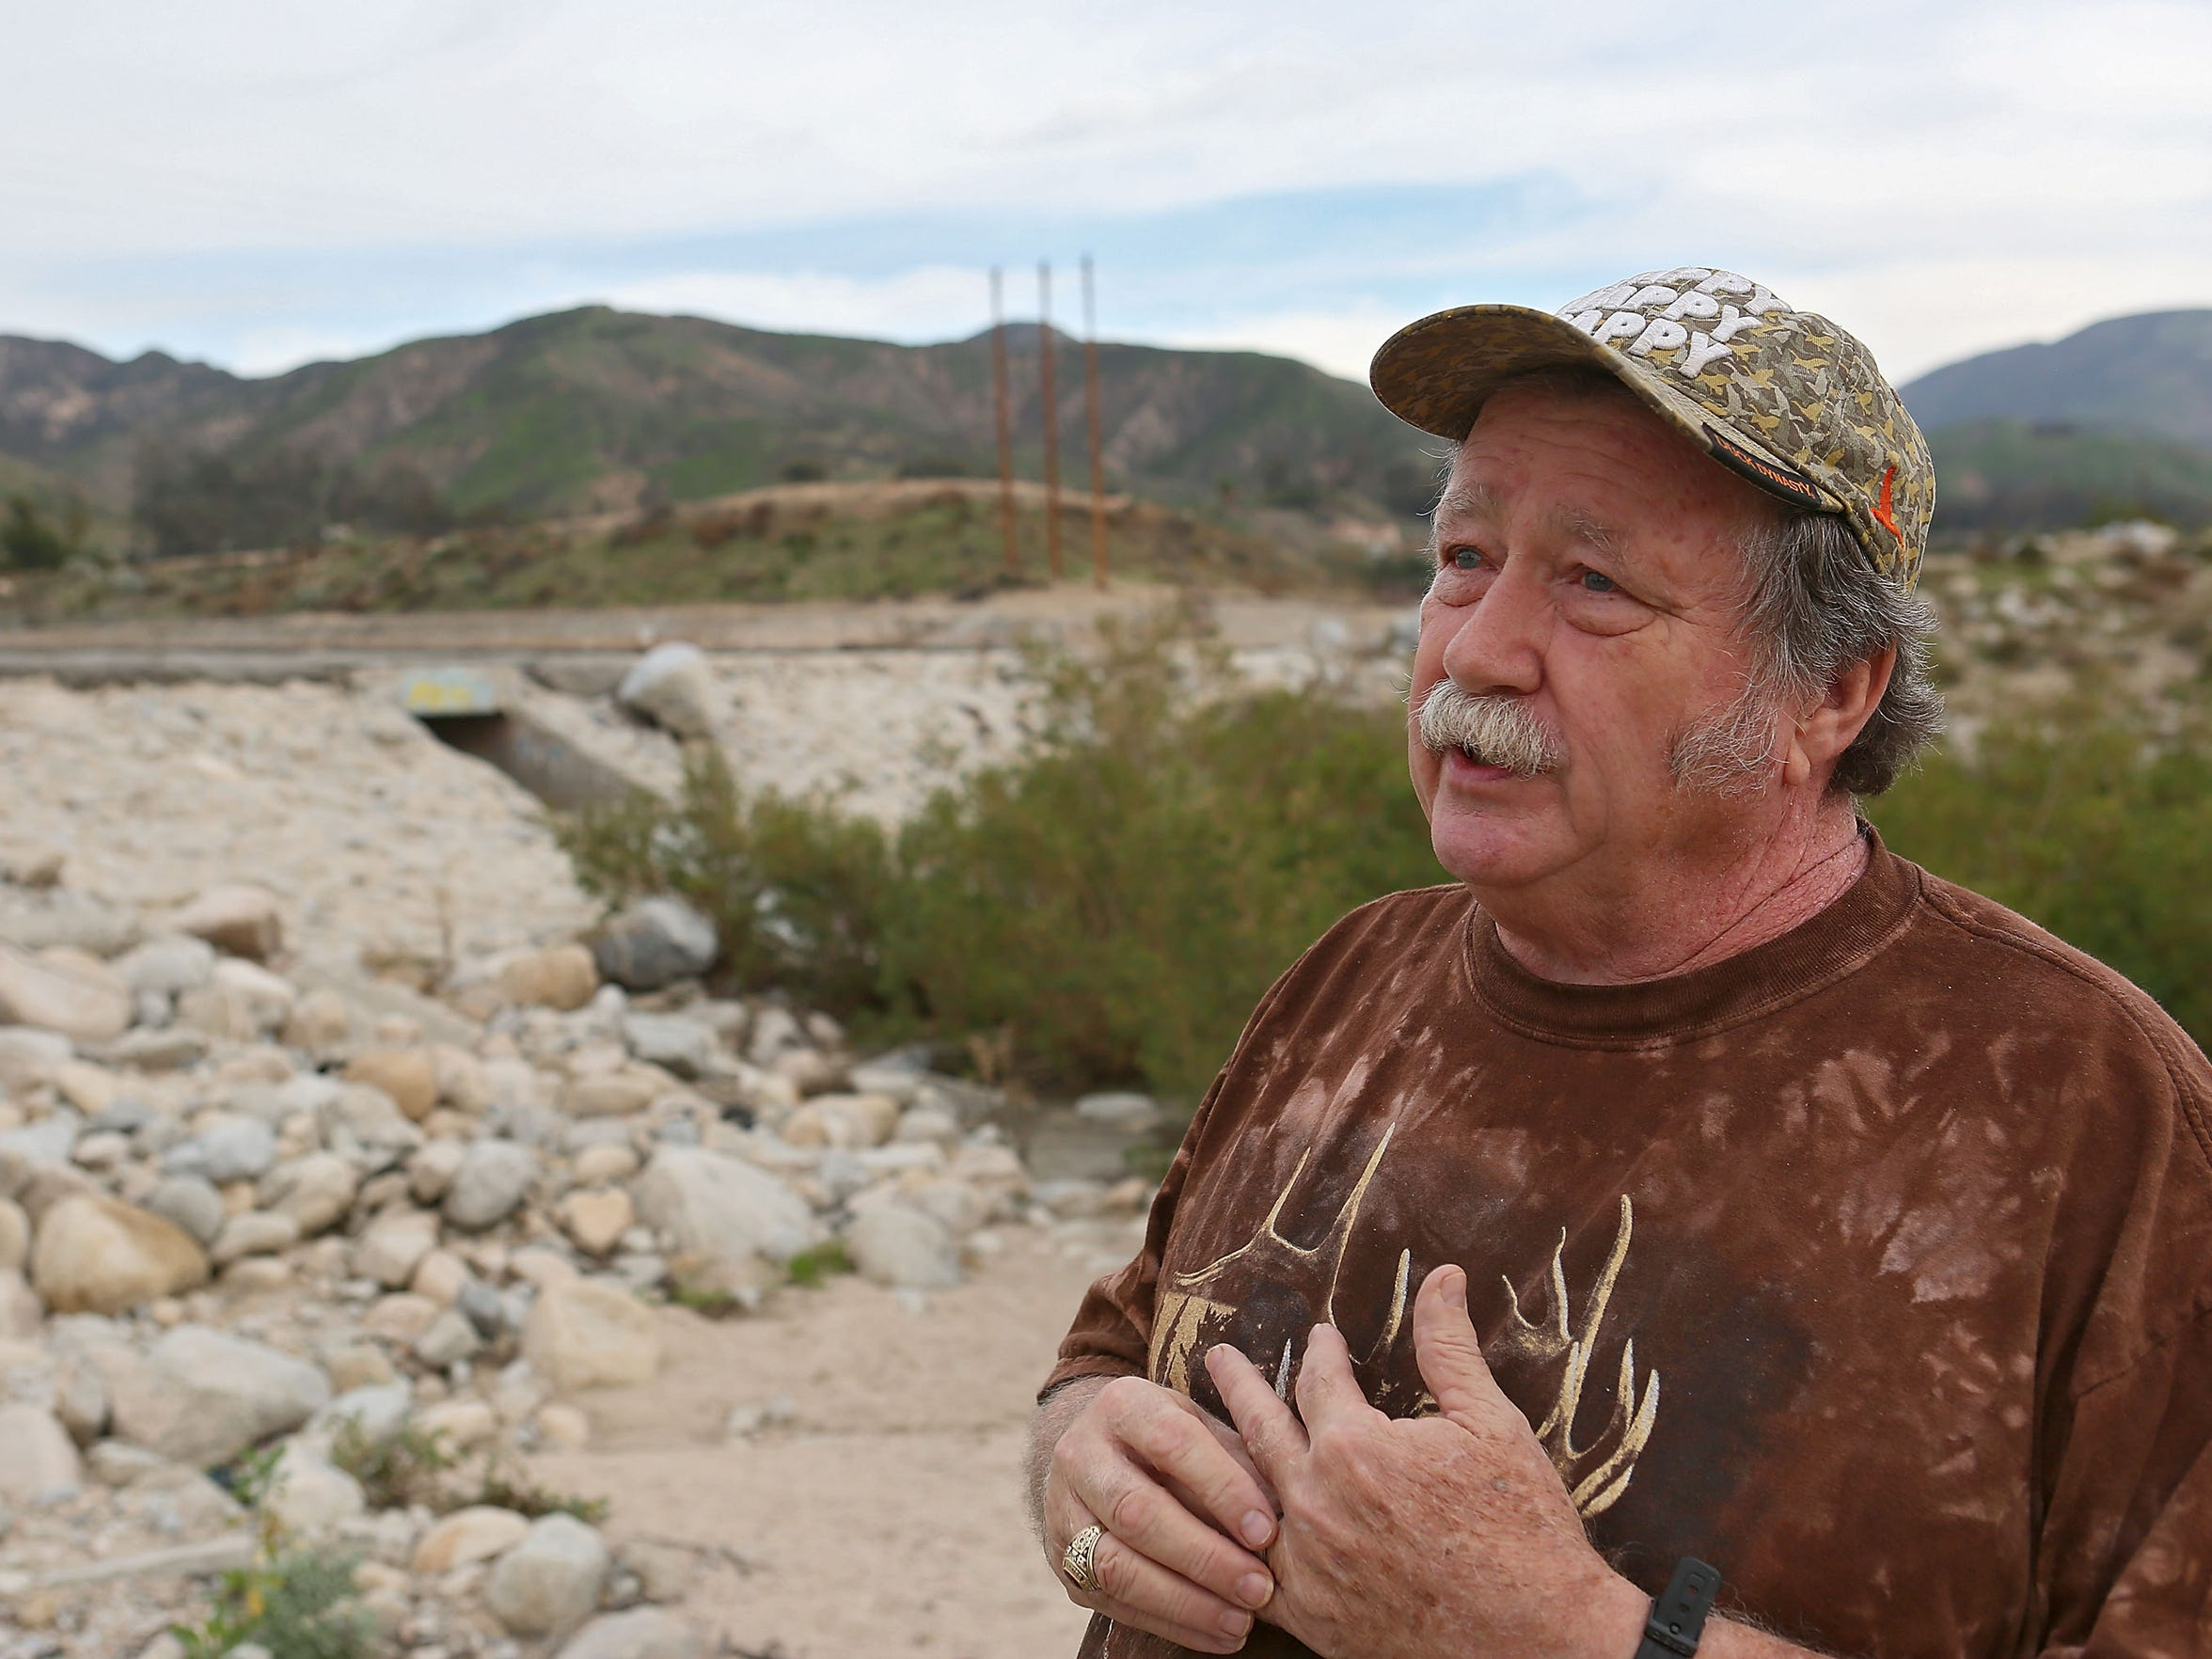 Retired Forest Service biologist Steve Loe voices concerns